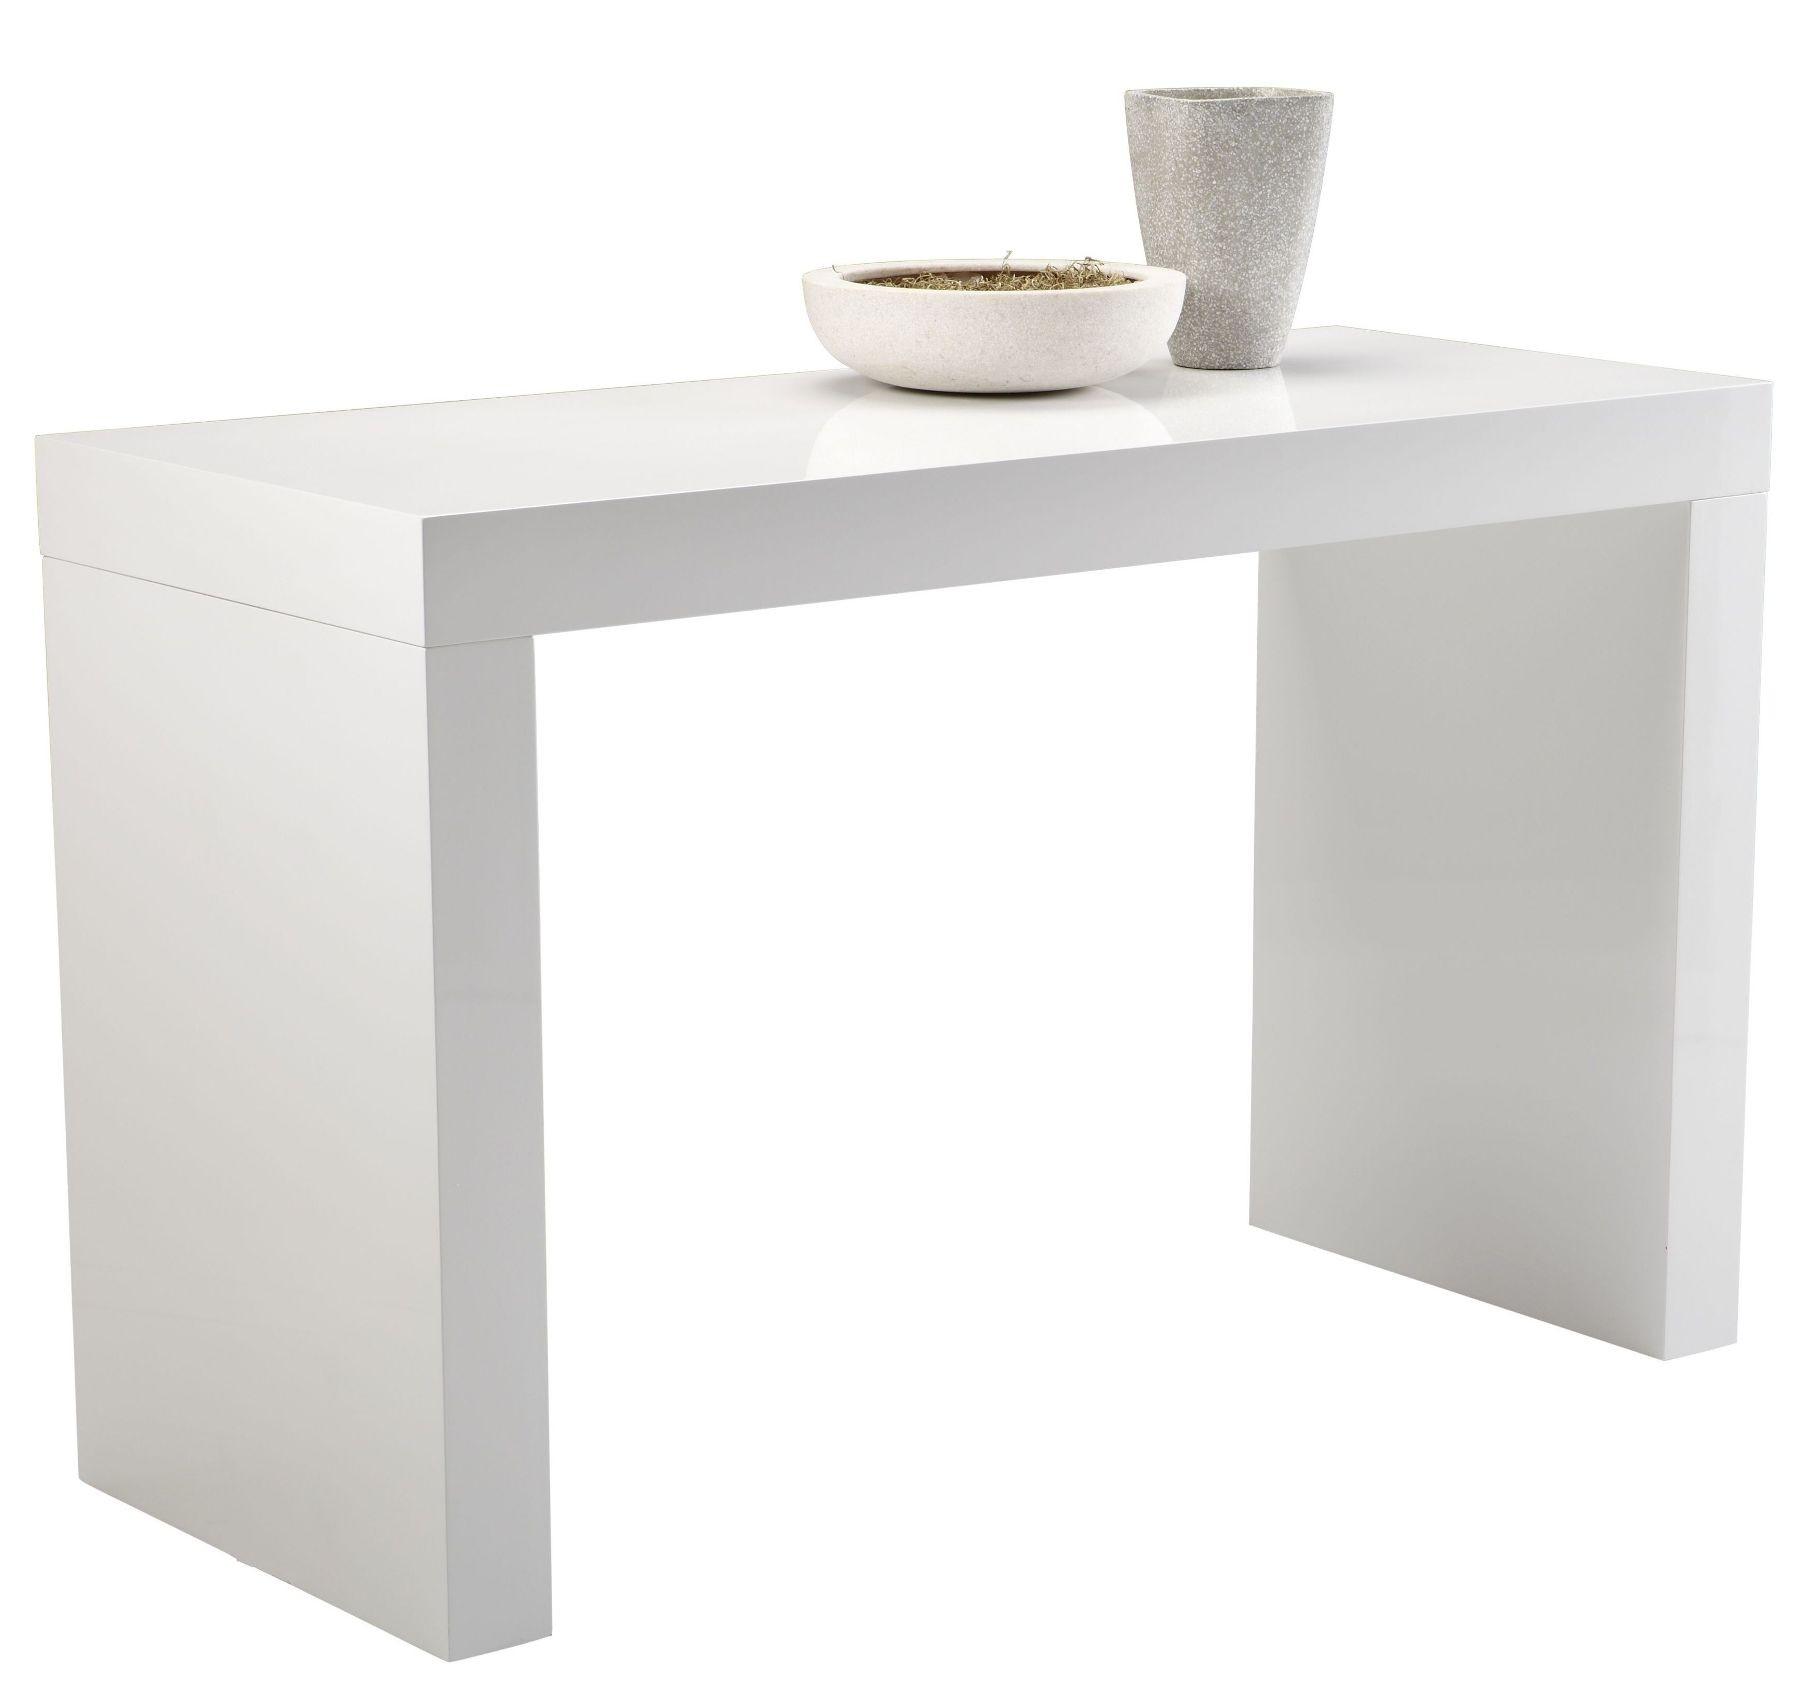 faro white high gloss cshape counter table from sunpan (  -